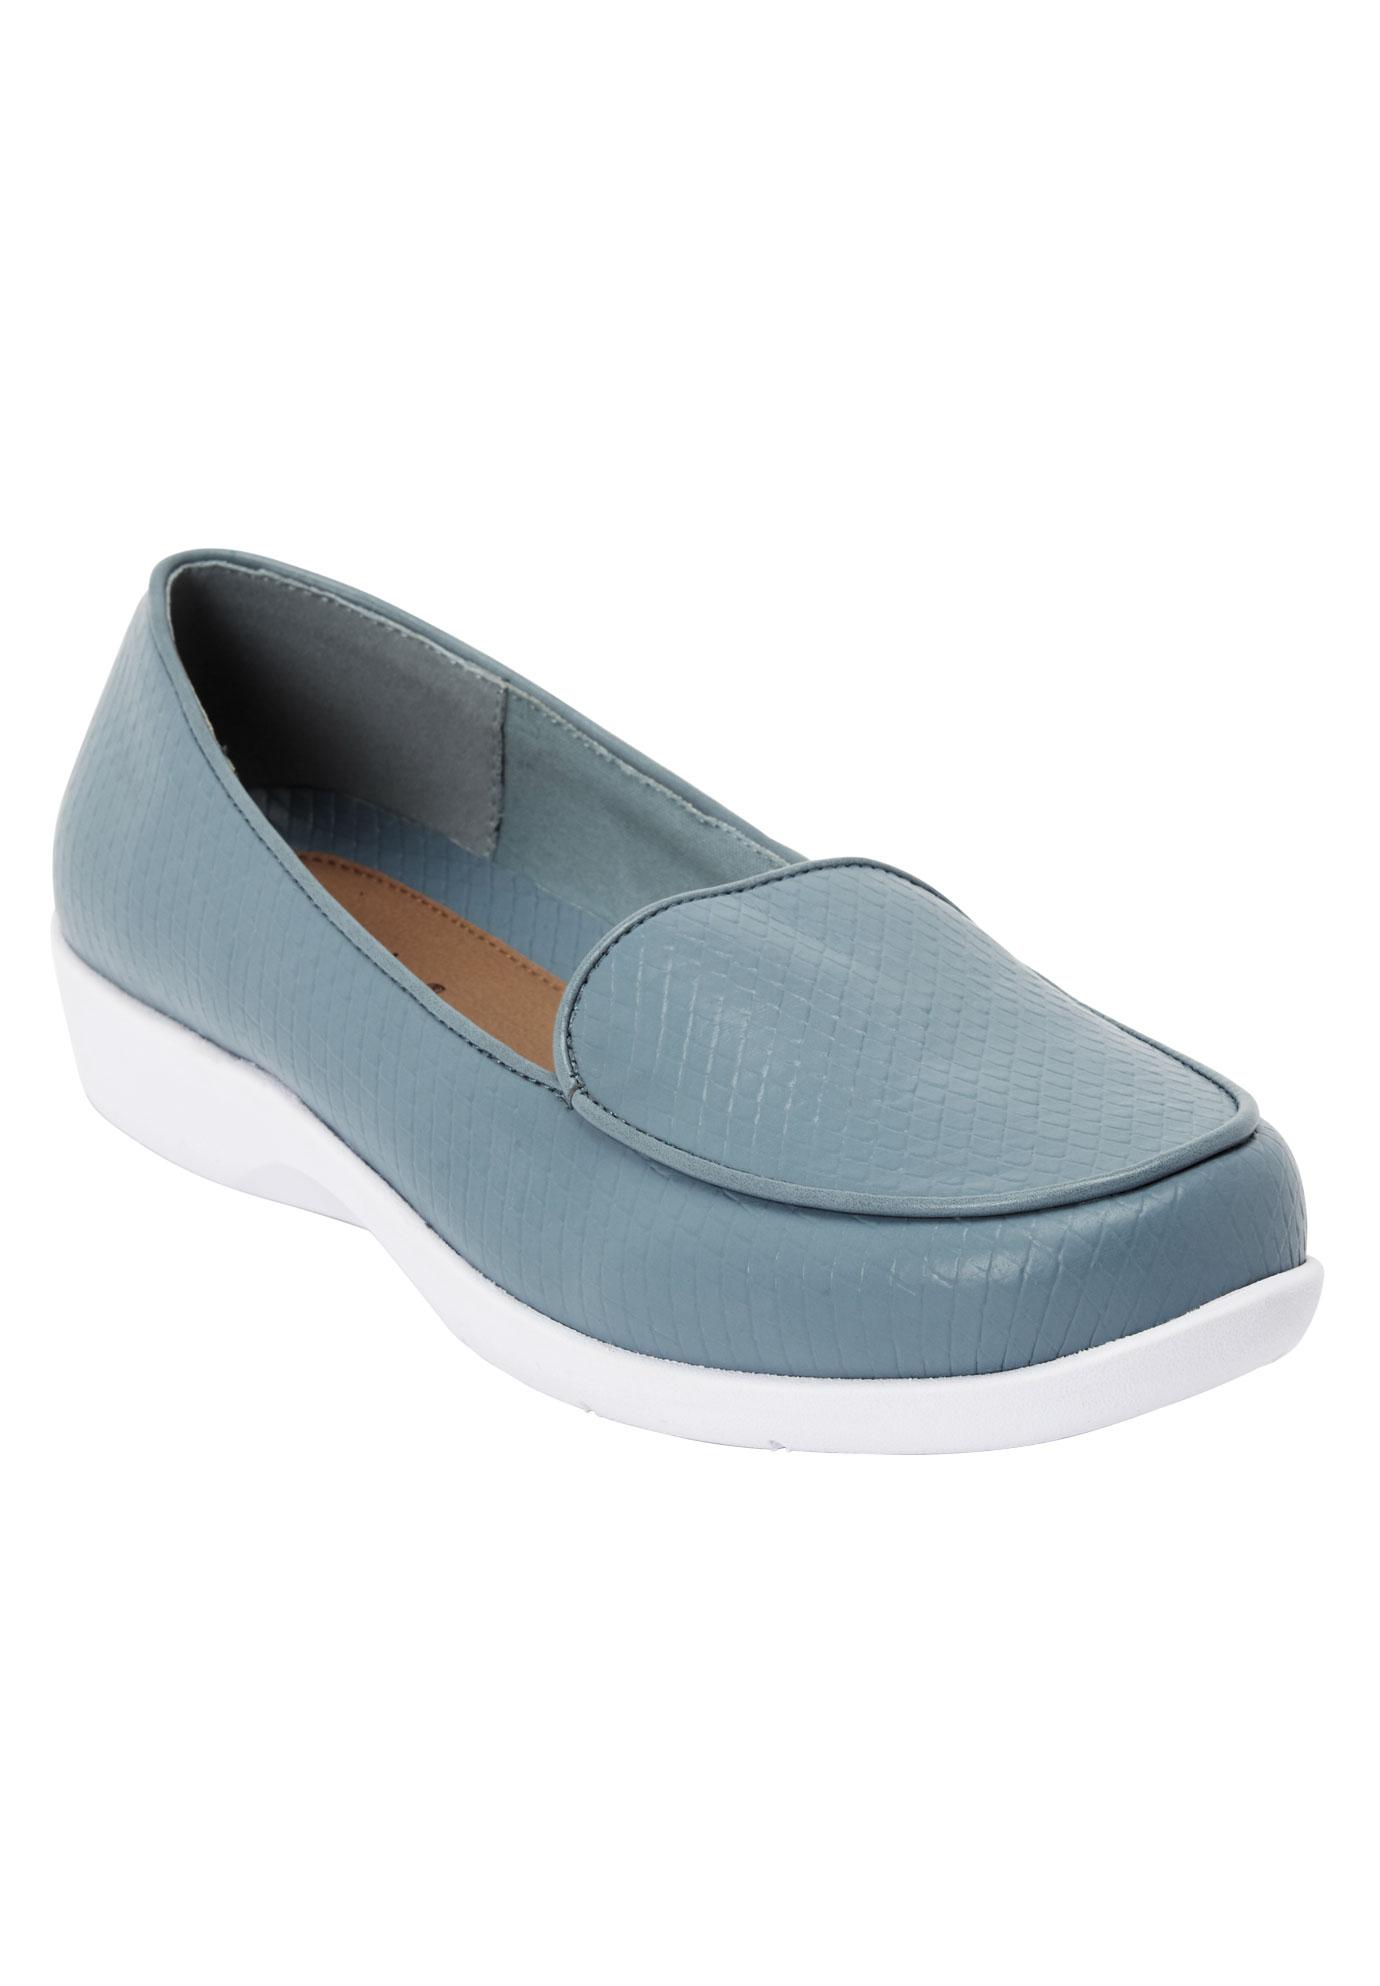 Blue Womens Flats - Walmart.com